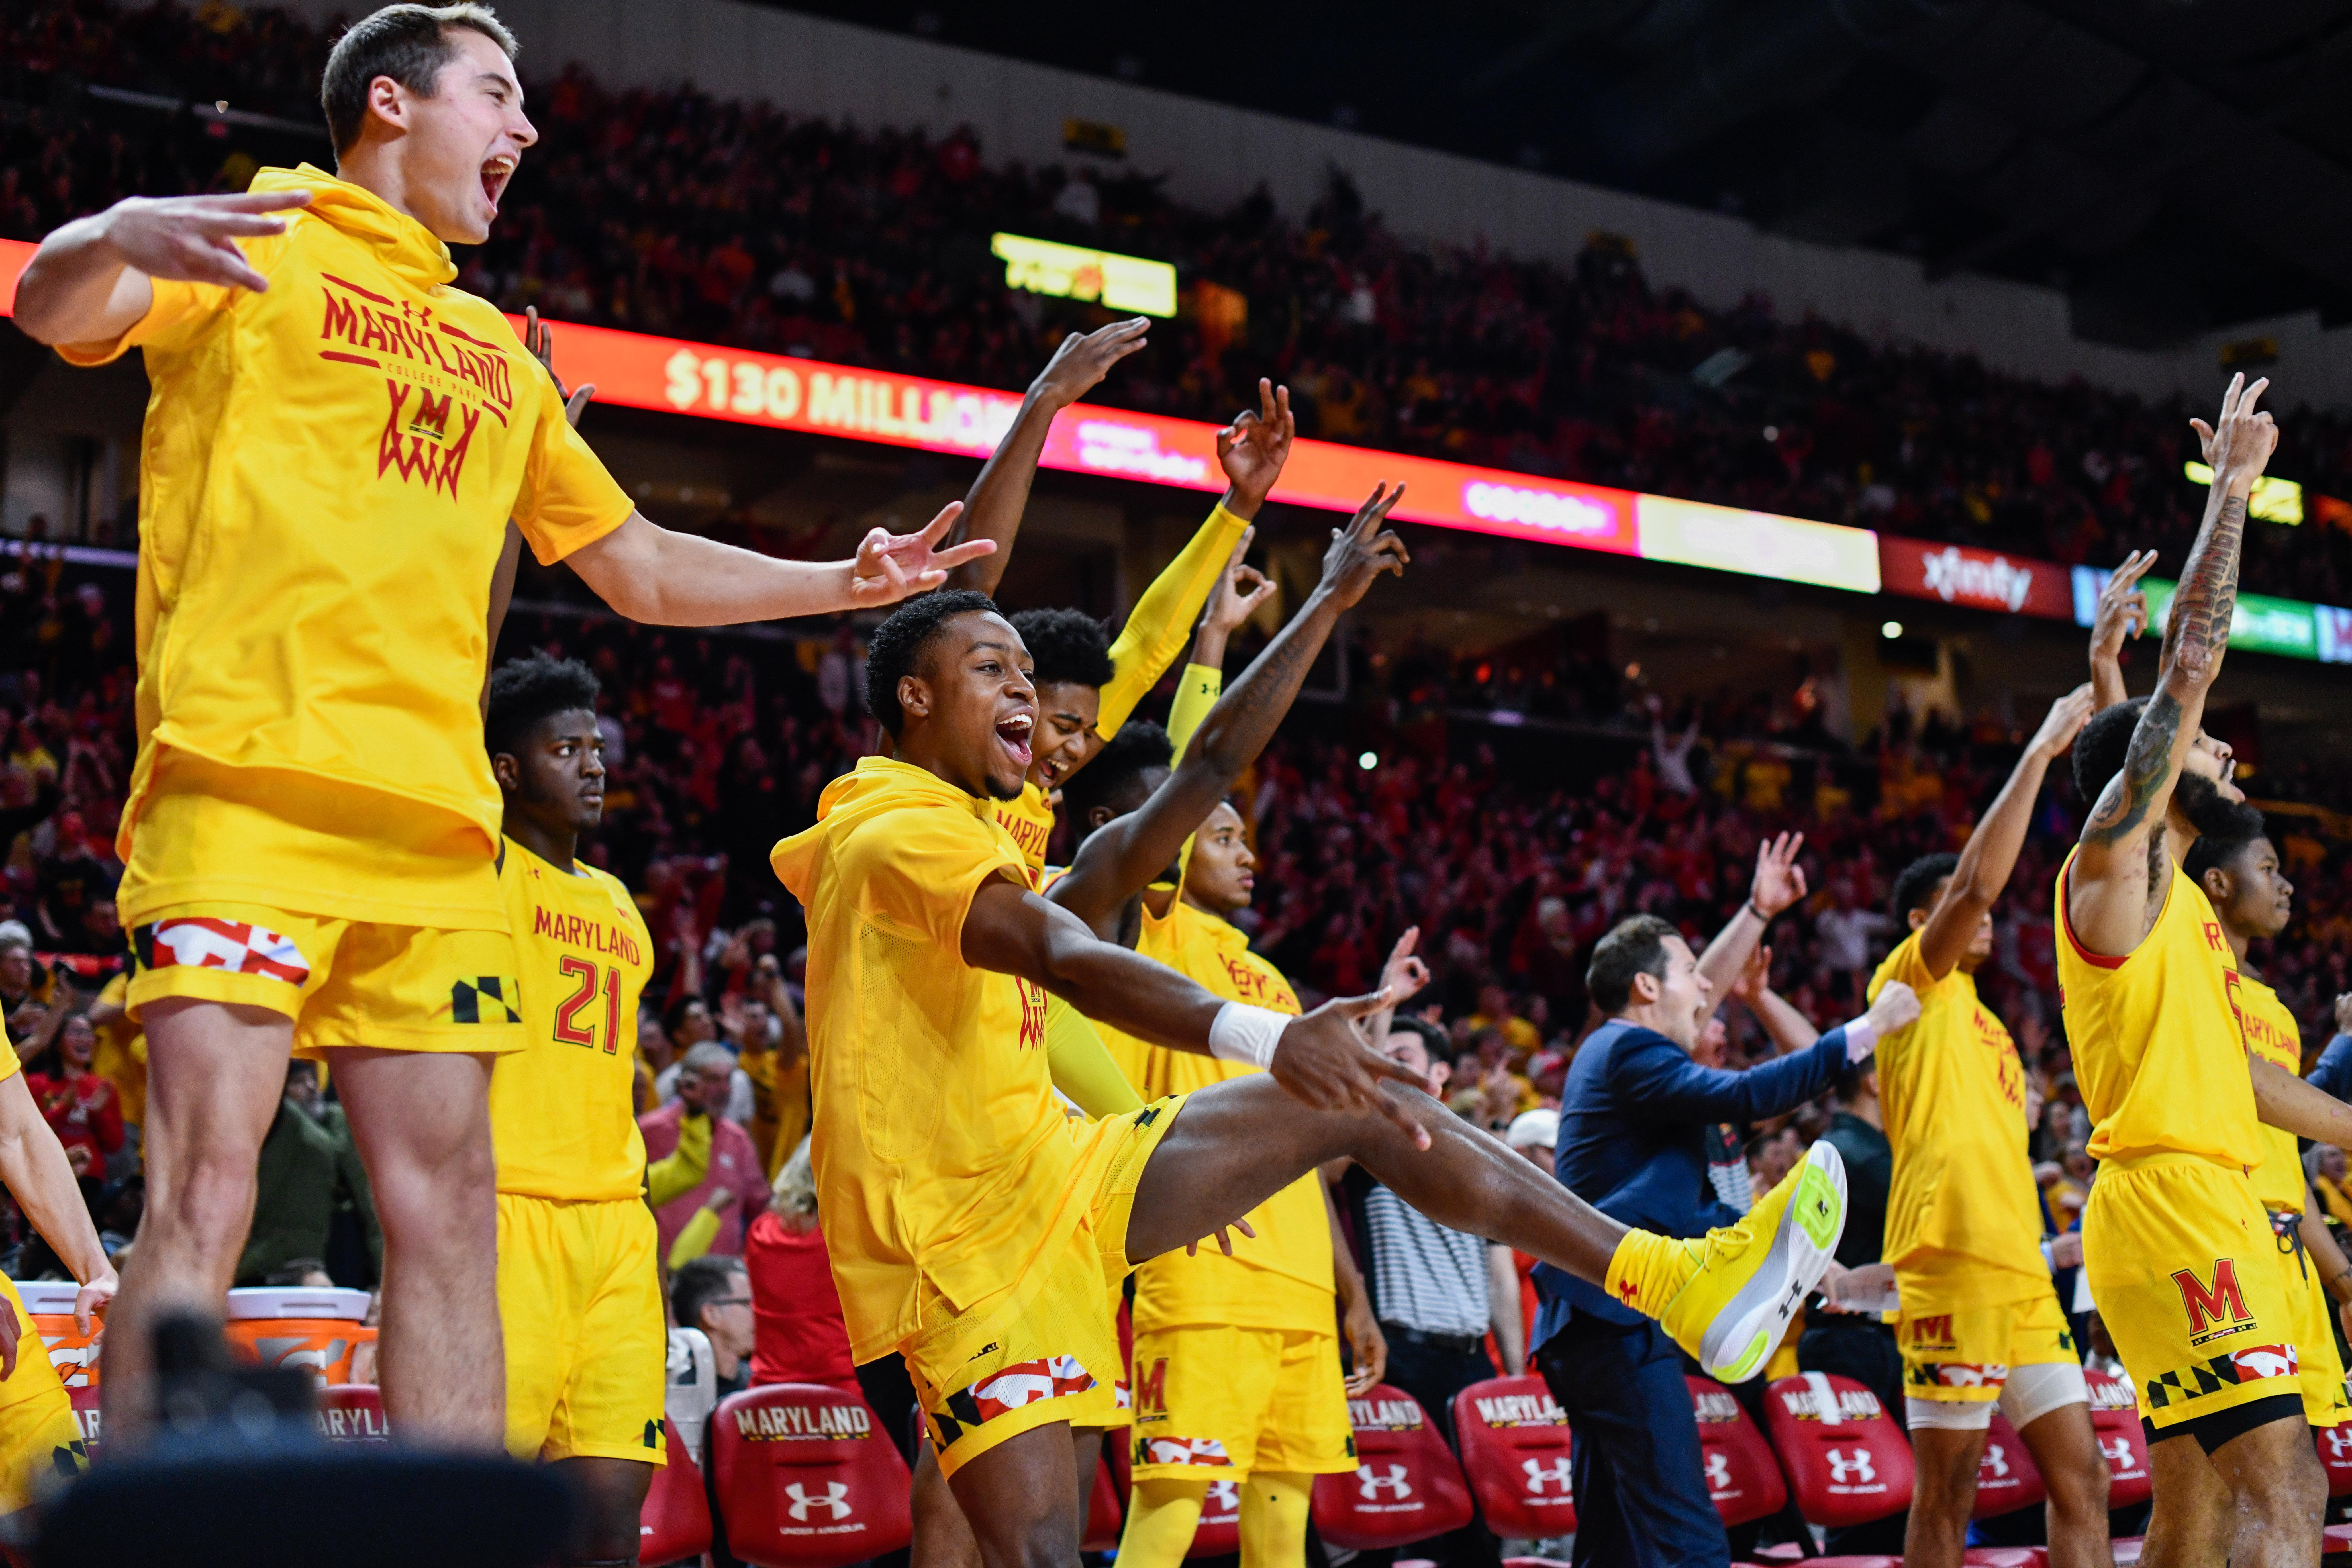 Illinois, Maryland basketball